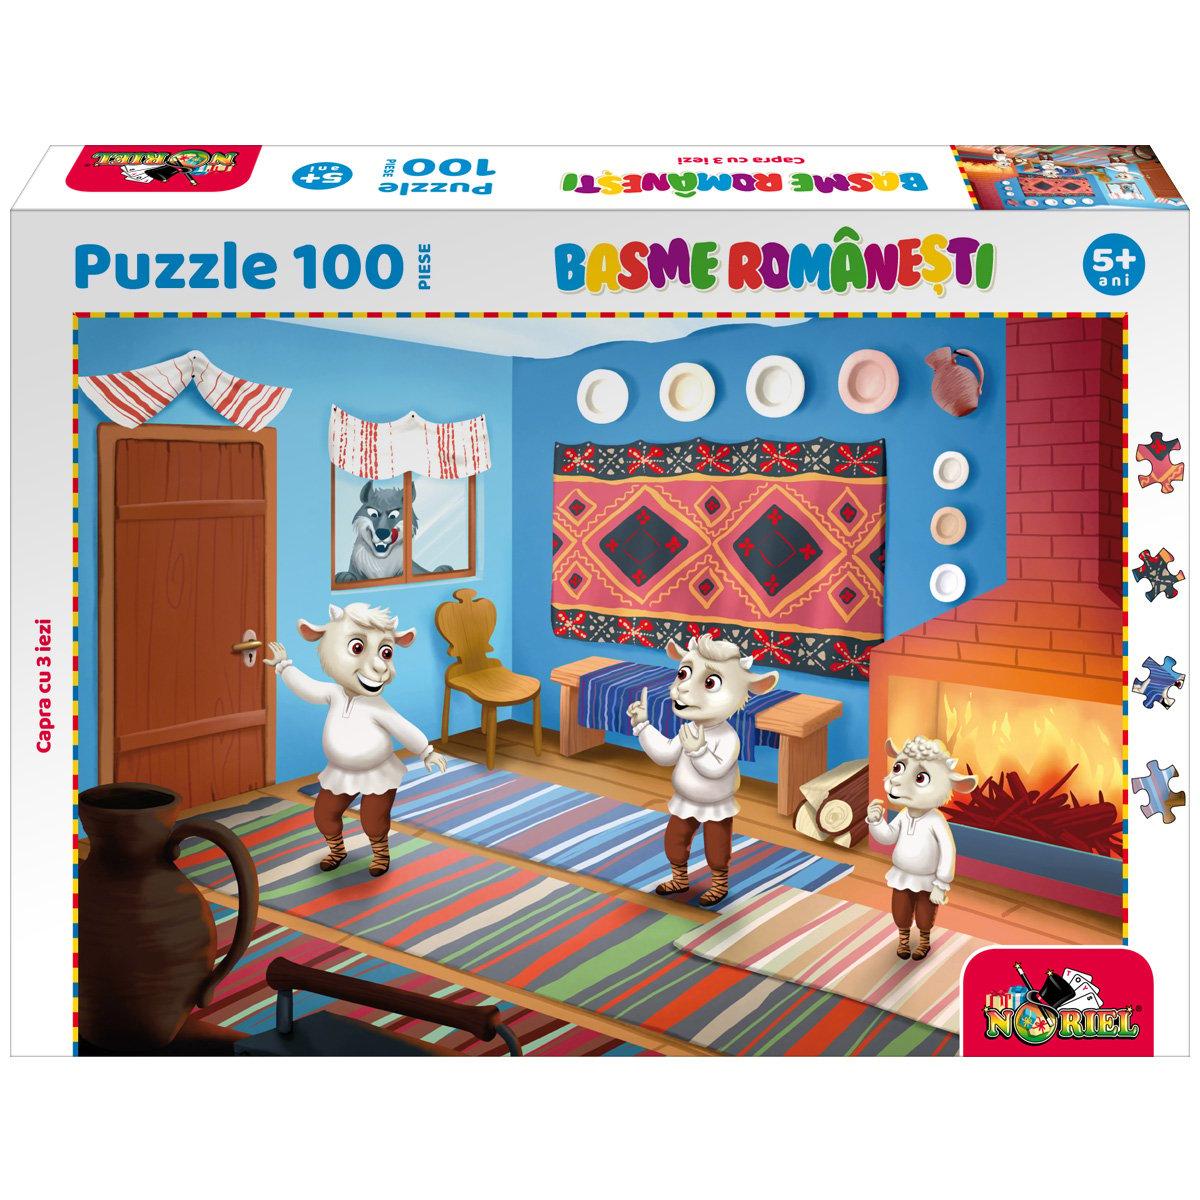 Puzzle 100 piese, Noriel Basme Romanesti, Capra cu trei iezi